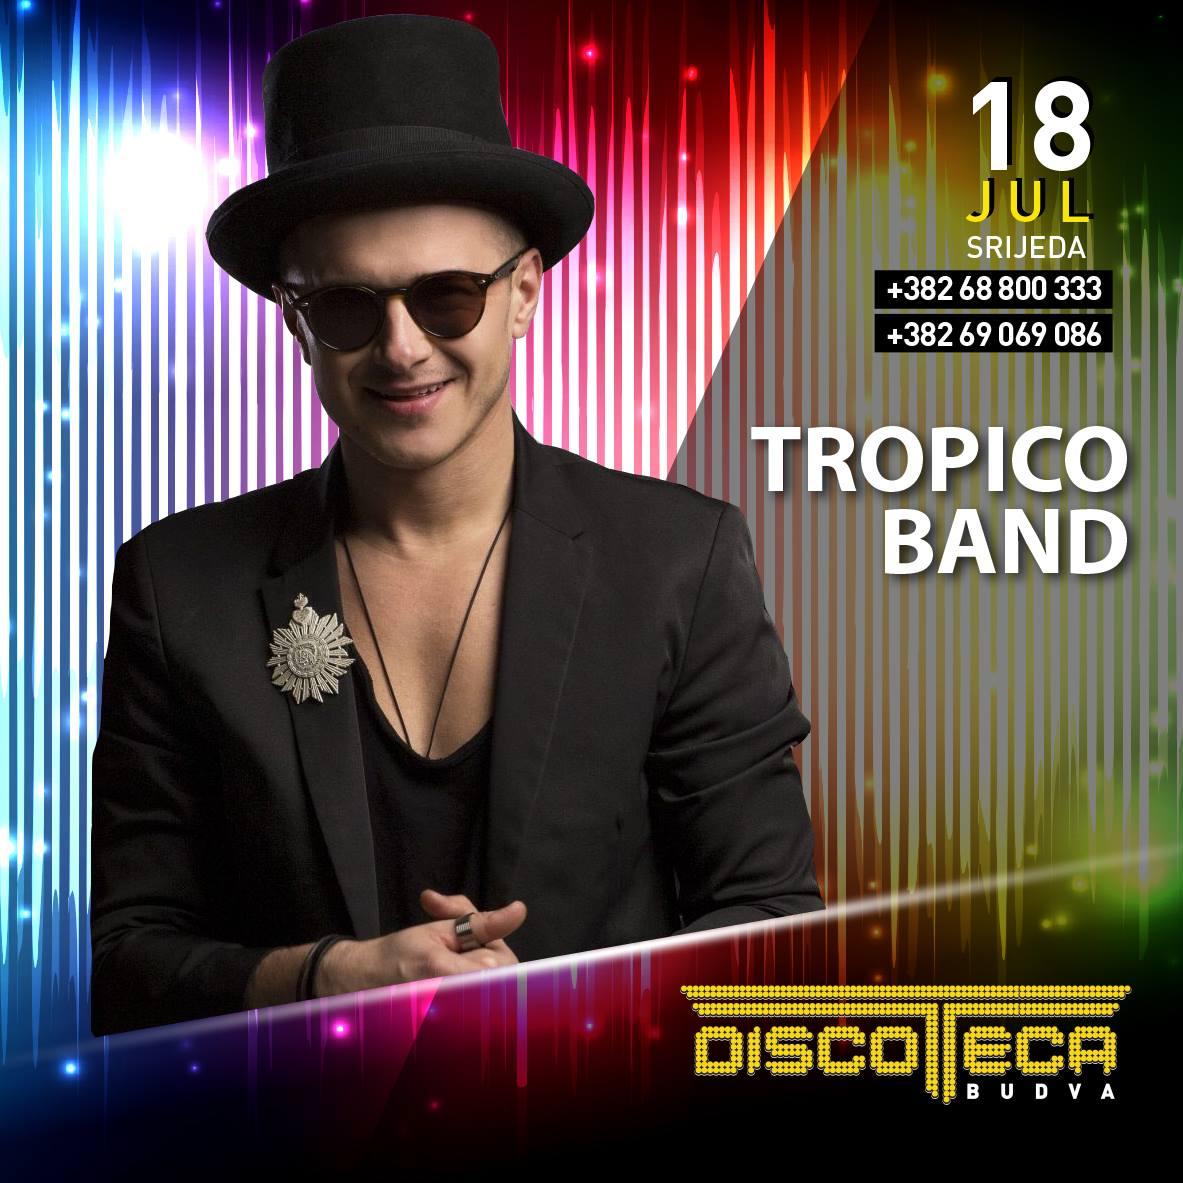 Tropico Band